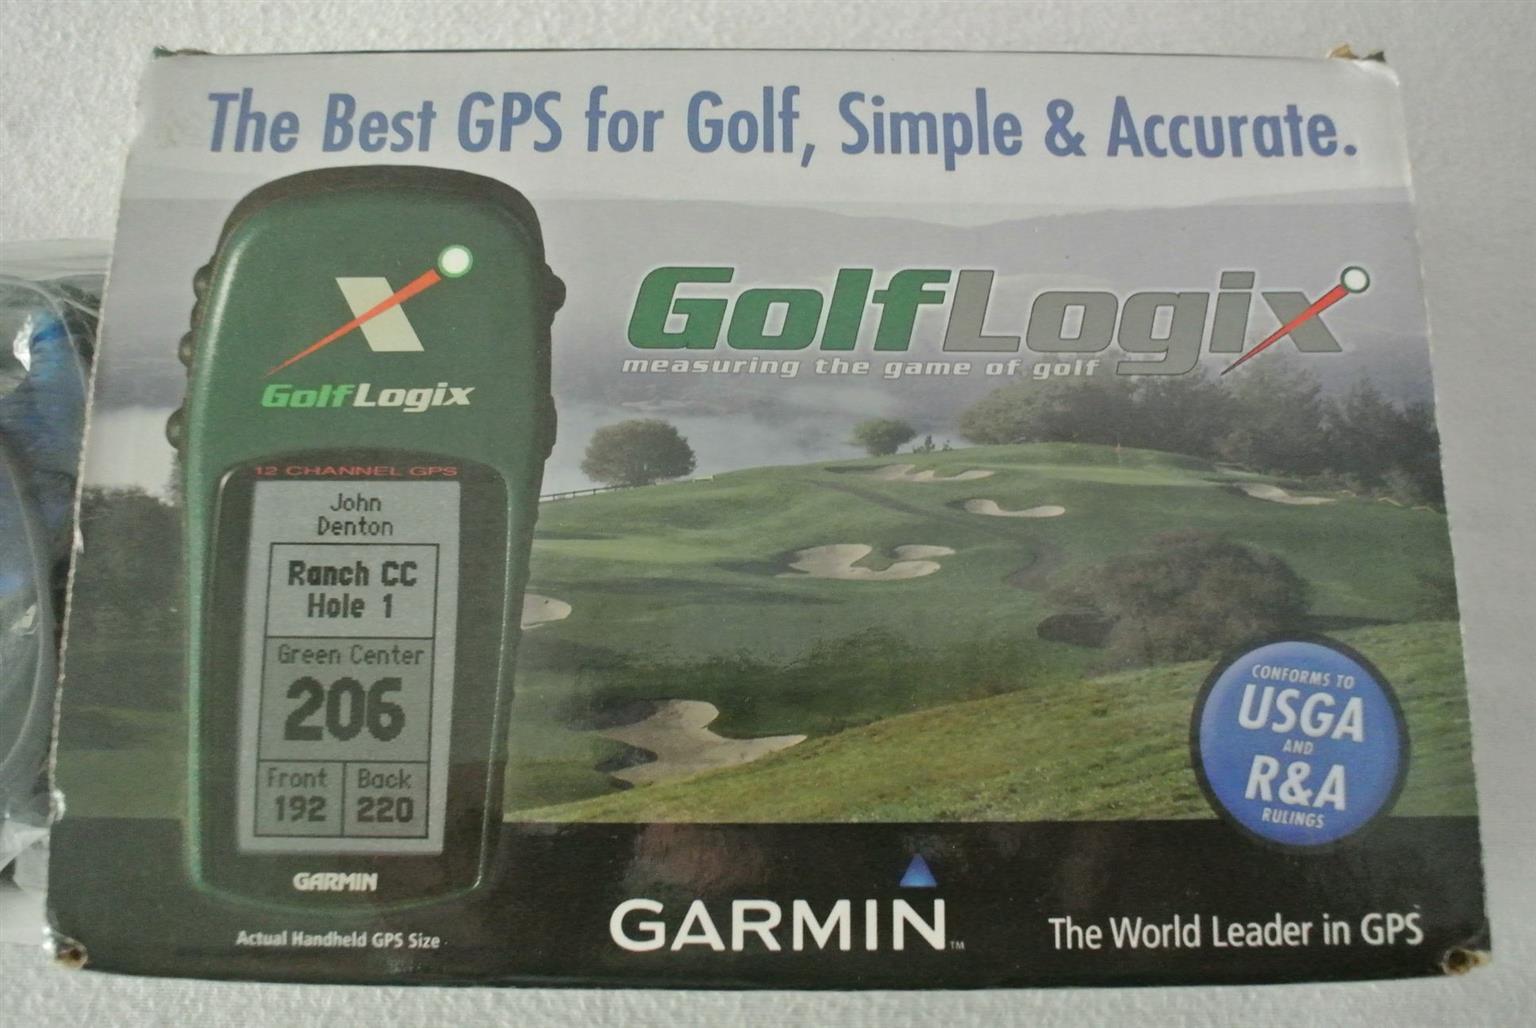 Garmin Golflogix Hand held GPS